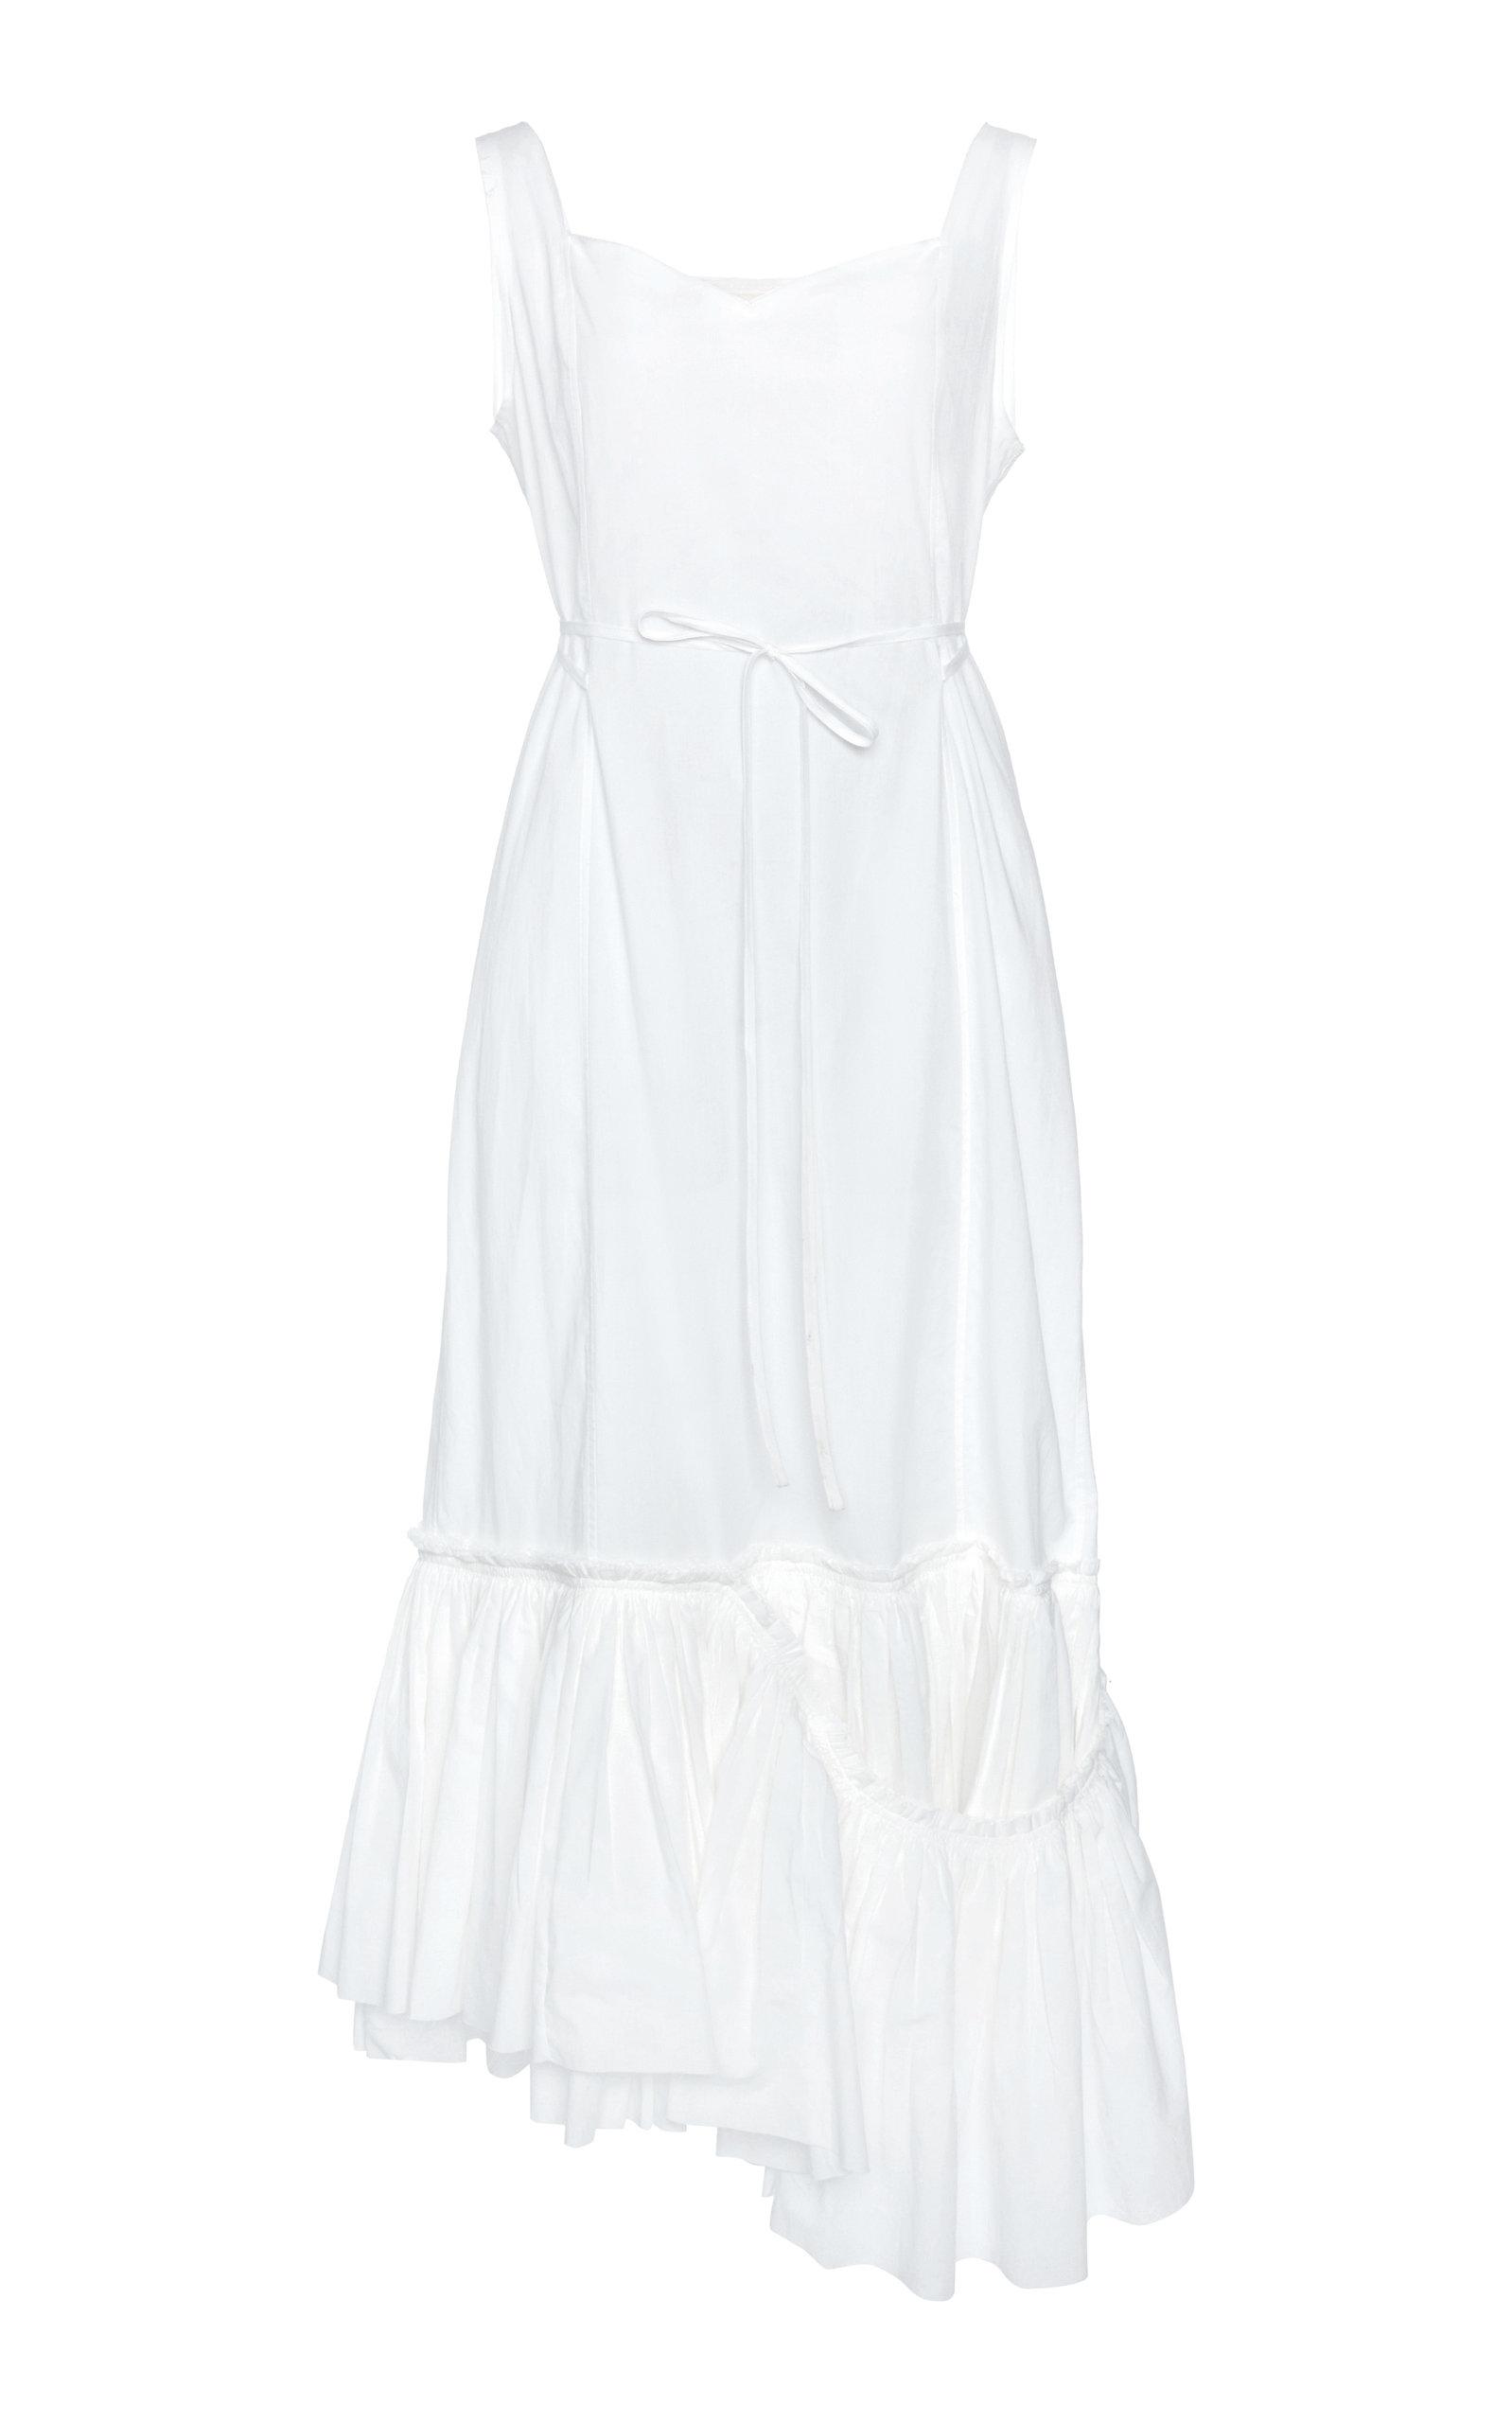 Buy Marni Asymmetric Ruffled Cotton Midi Dress online, shop Marni at the best price